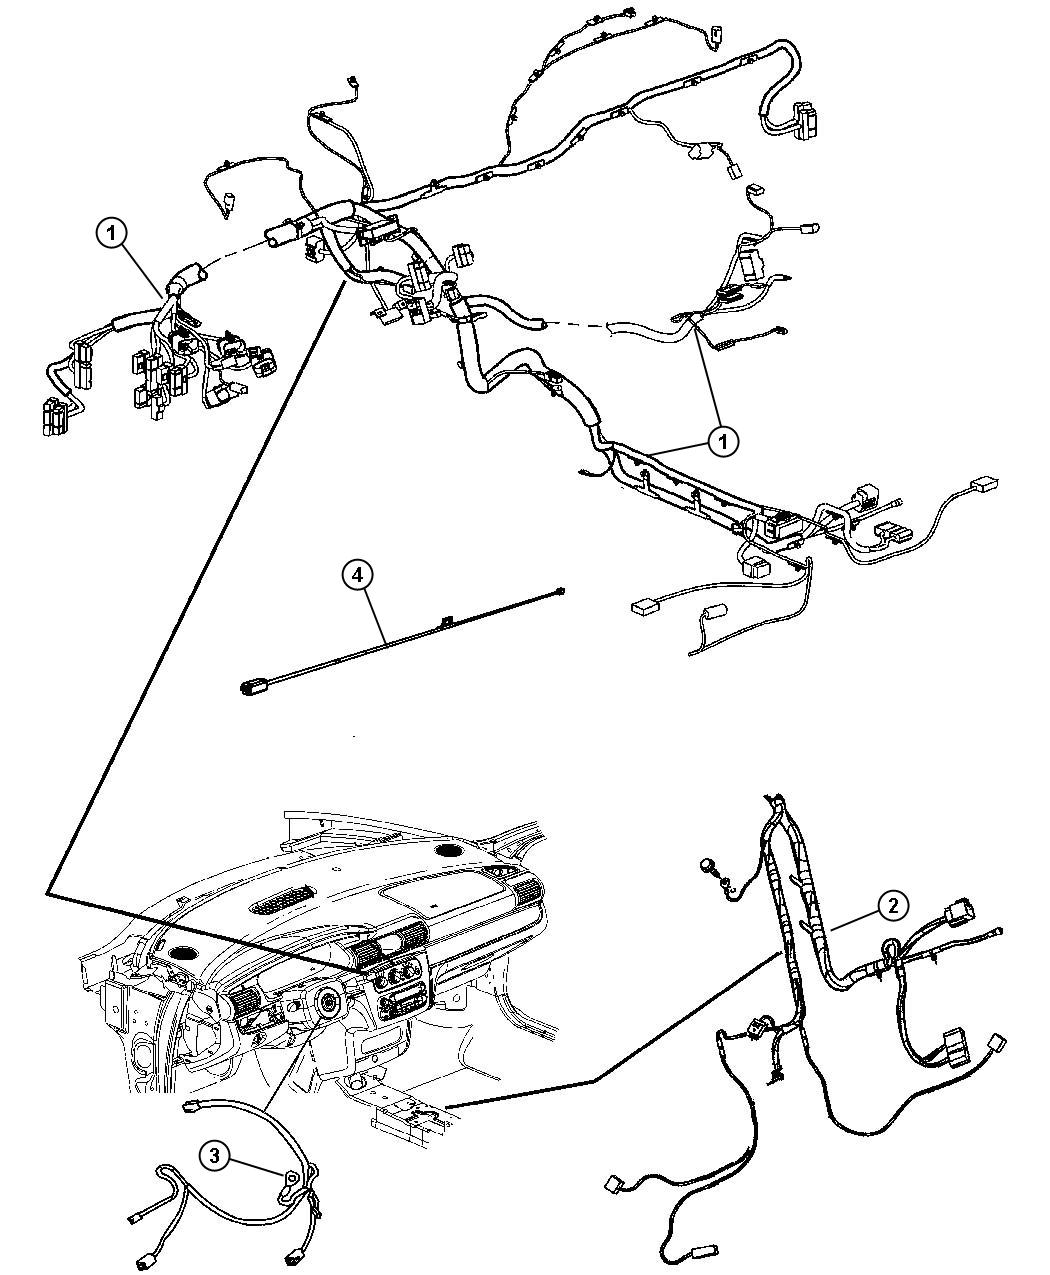 Chrysler Sebring Wiring. Steering wheel. Trim: [all trim